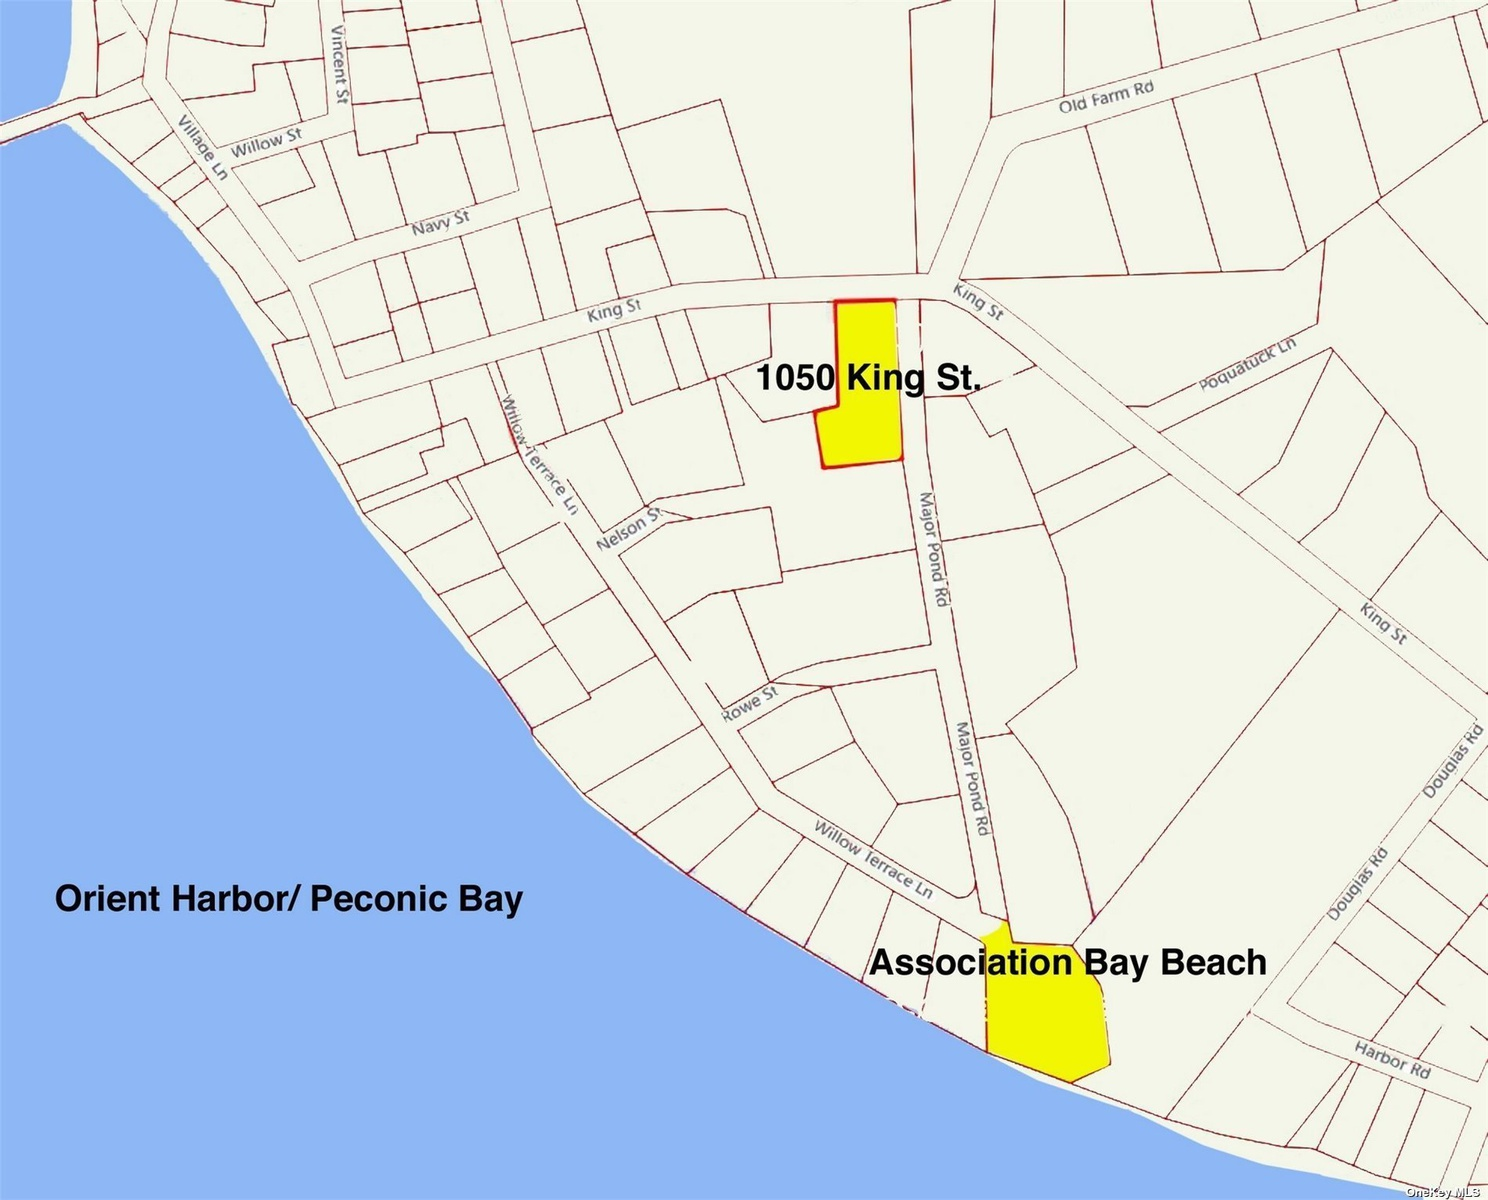 walk to association bay beach